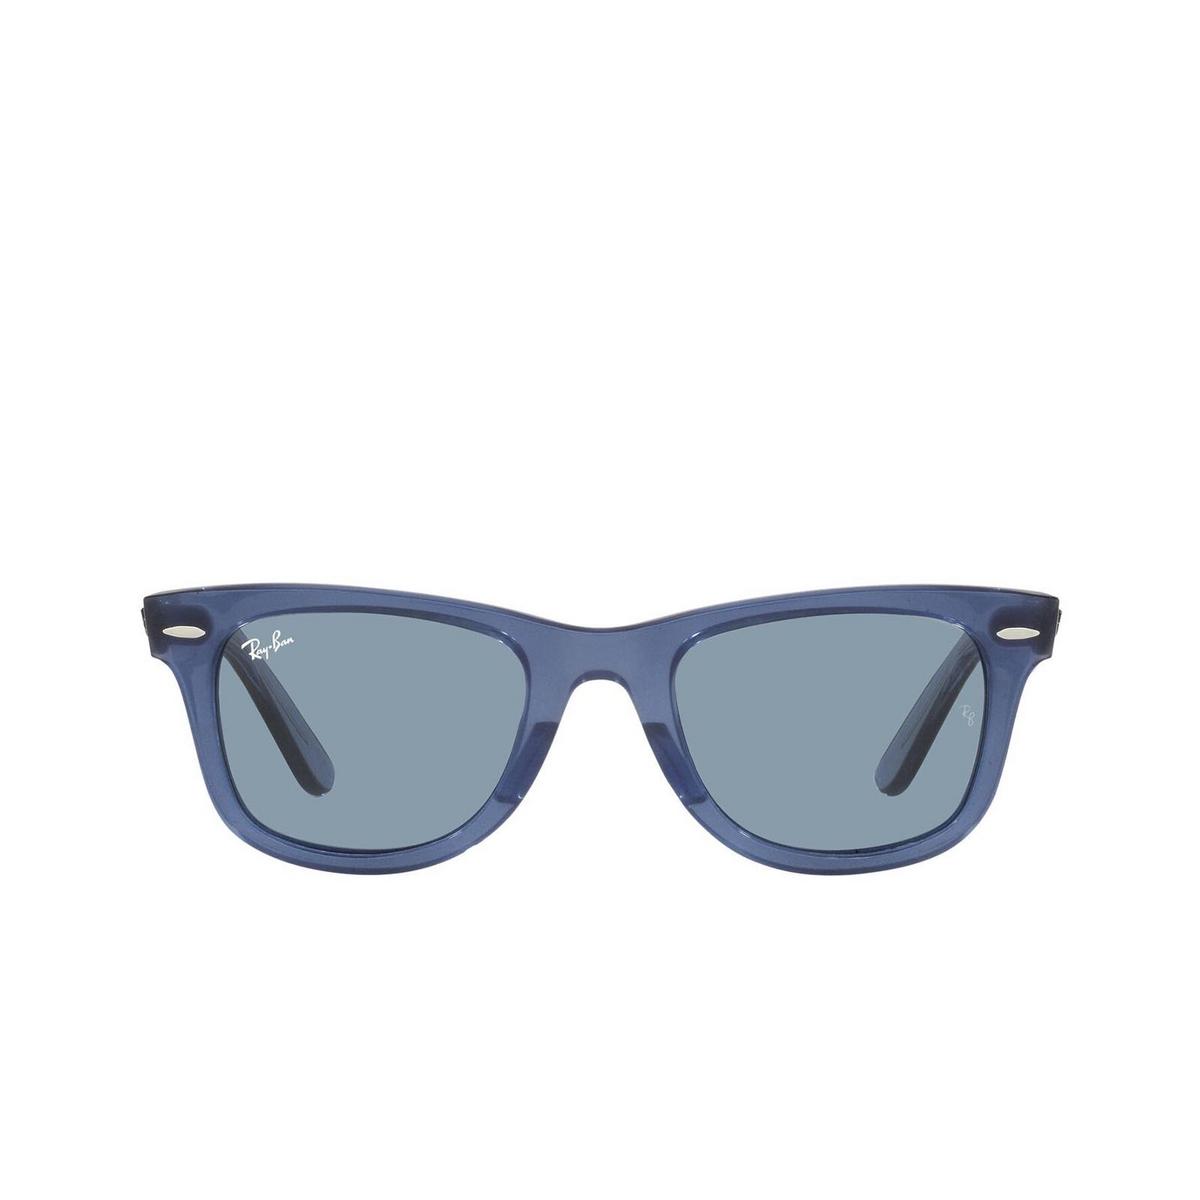 Ray-Ban® Square Sunglasses: Wayfarer RB2140 color True Blue 658756.